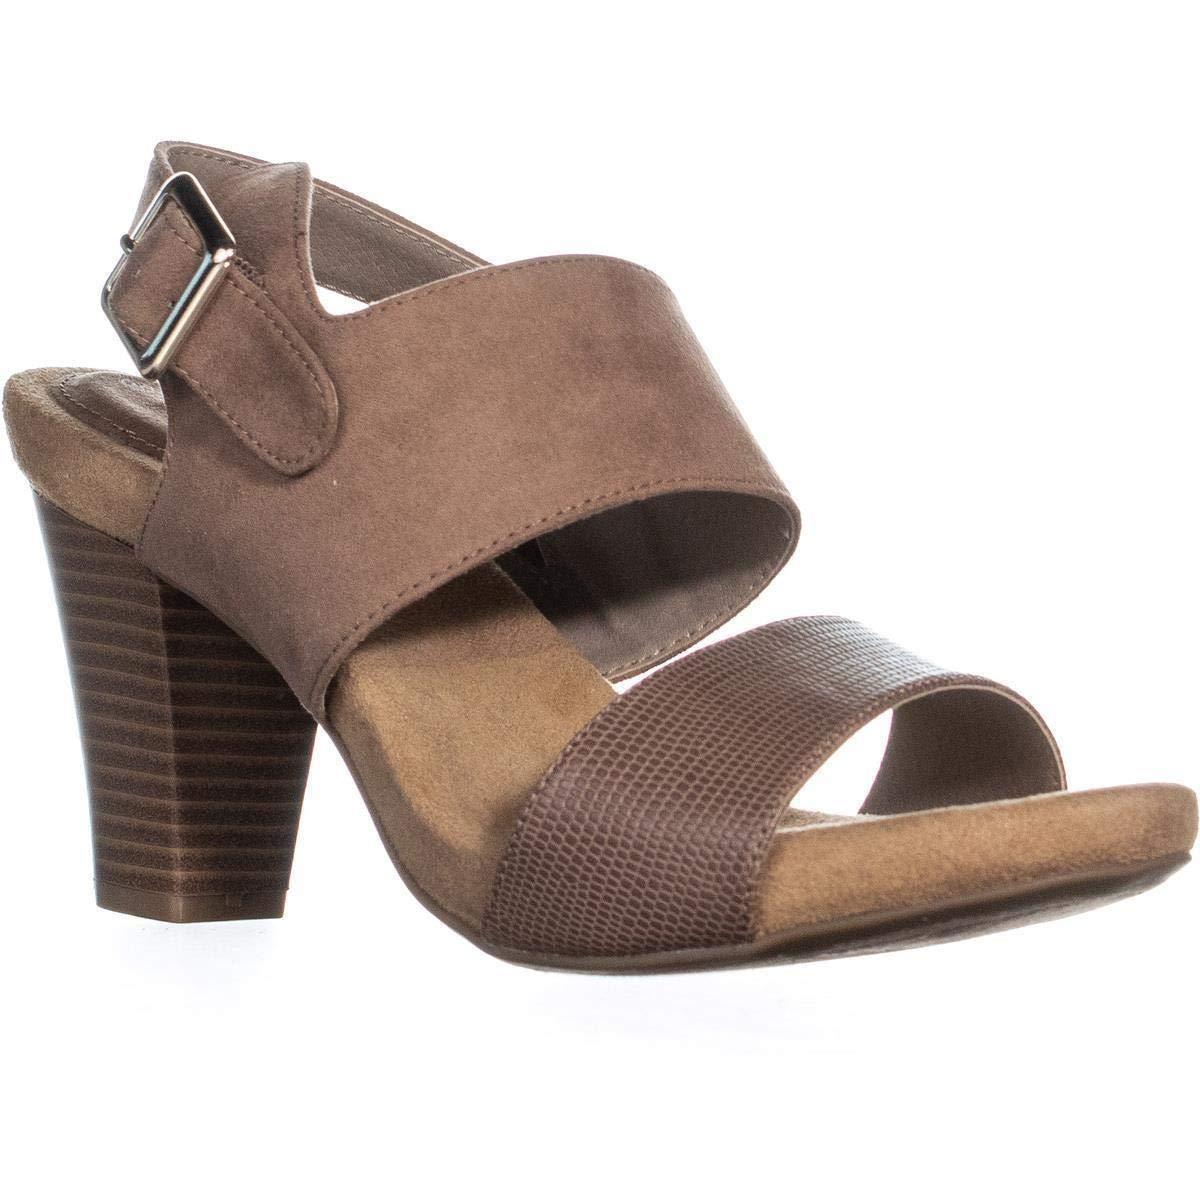 Dark Taupe Giani Bernini GB35 Aikko2 Ankle Strap Buckle Sandals, Dark Taupe